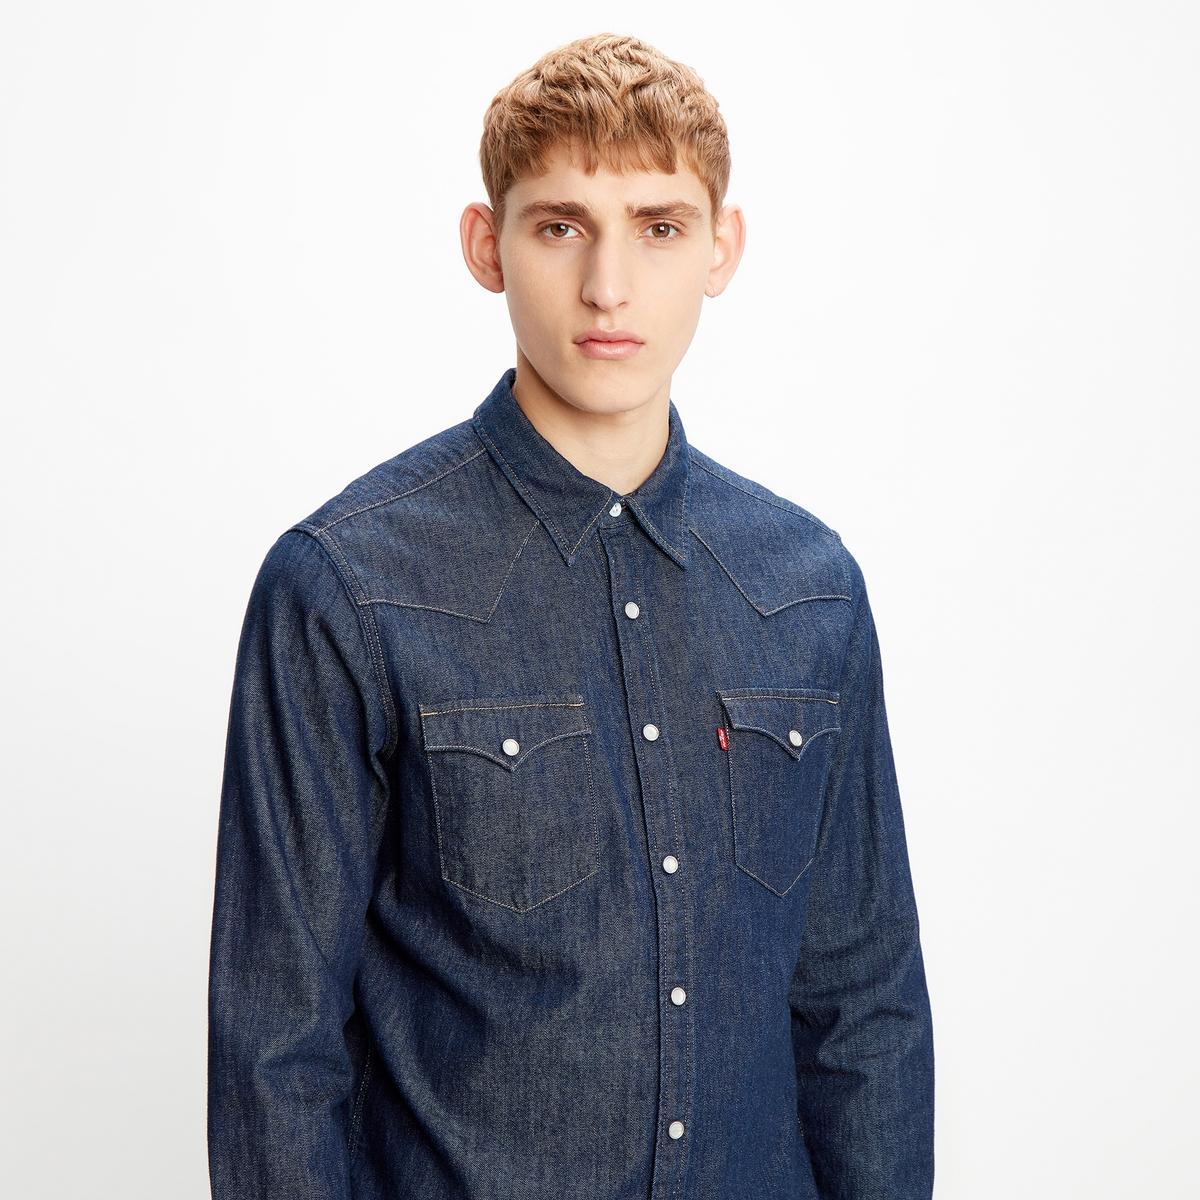 Image of Barstow Western Denim Shirt